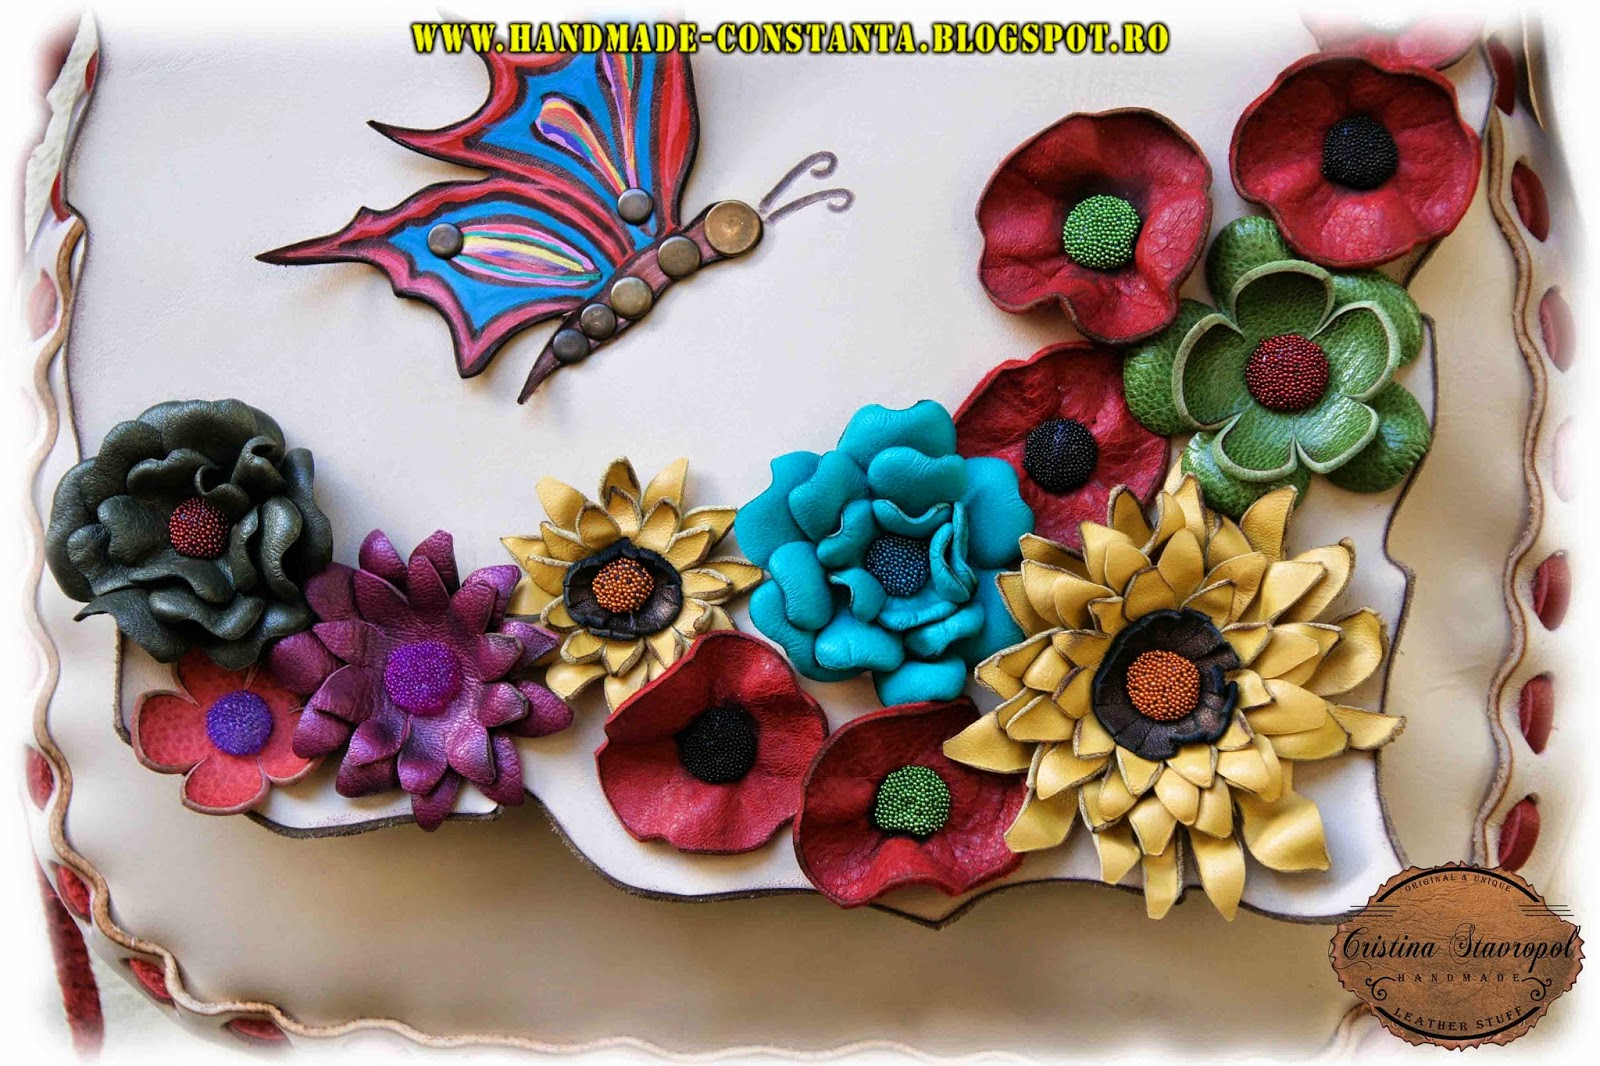 detaliu cu flori din piele